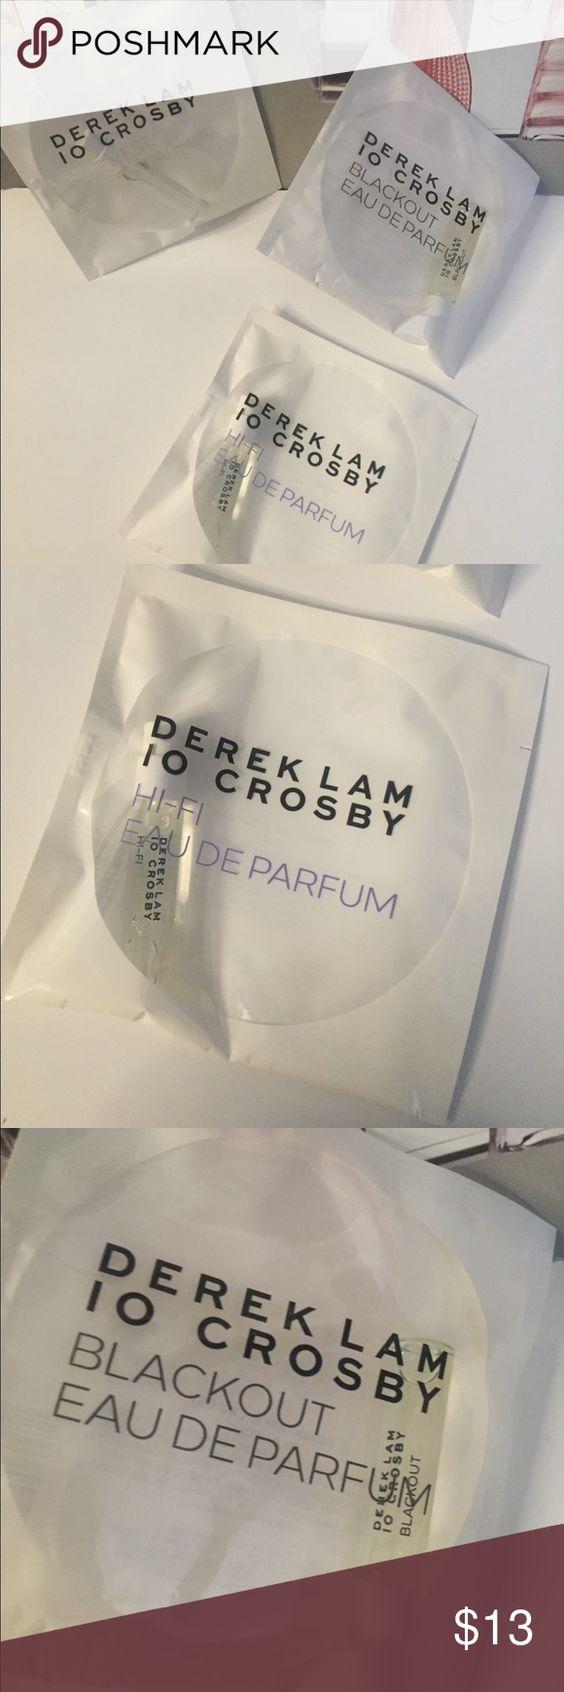 Derek Lam Derek Lam Perfume vial sample spray Sephora Makeup